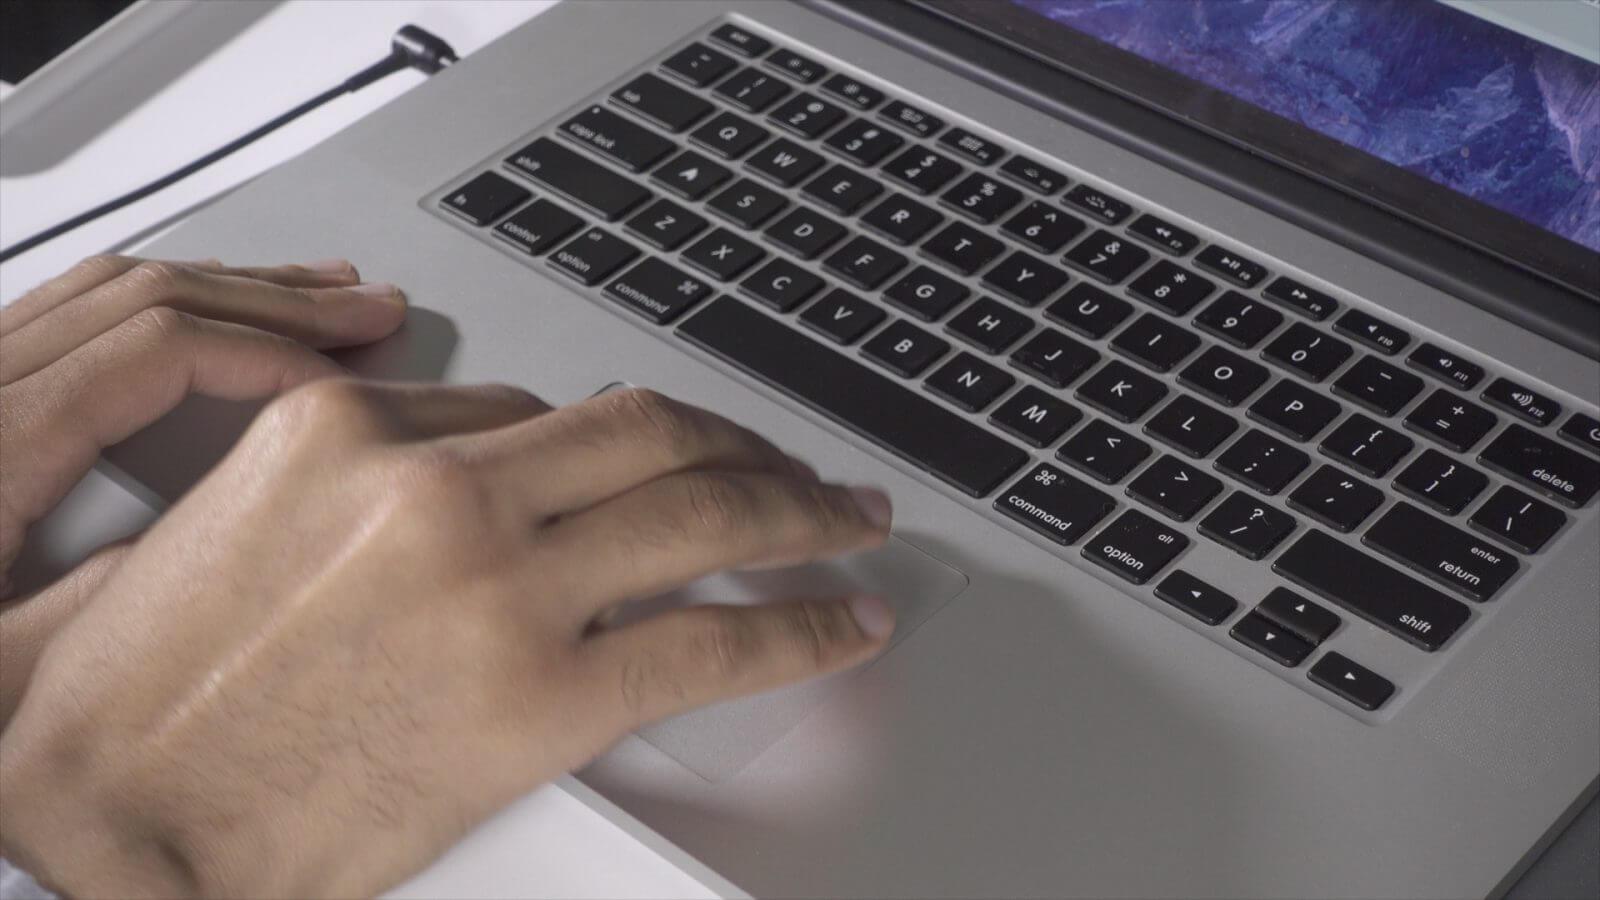 Mac Touchpad Ayarları Macbook Trackpad İncelemesi